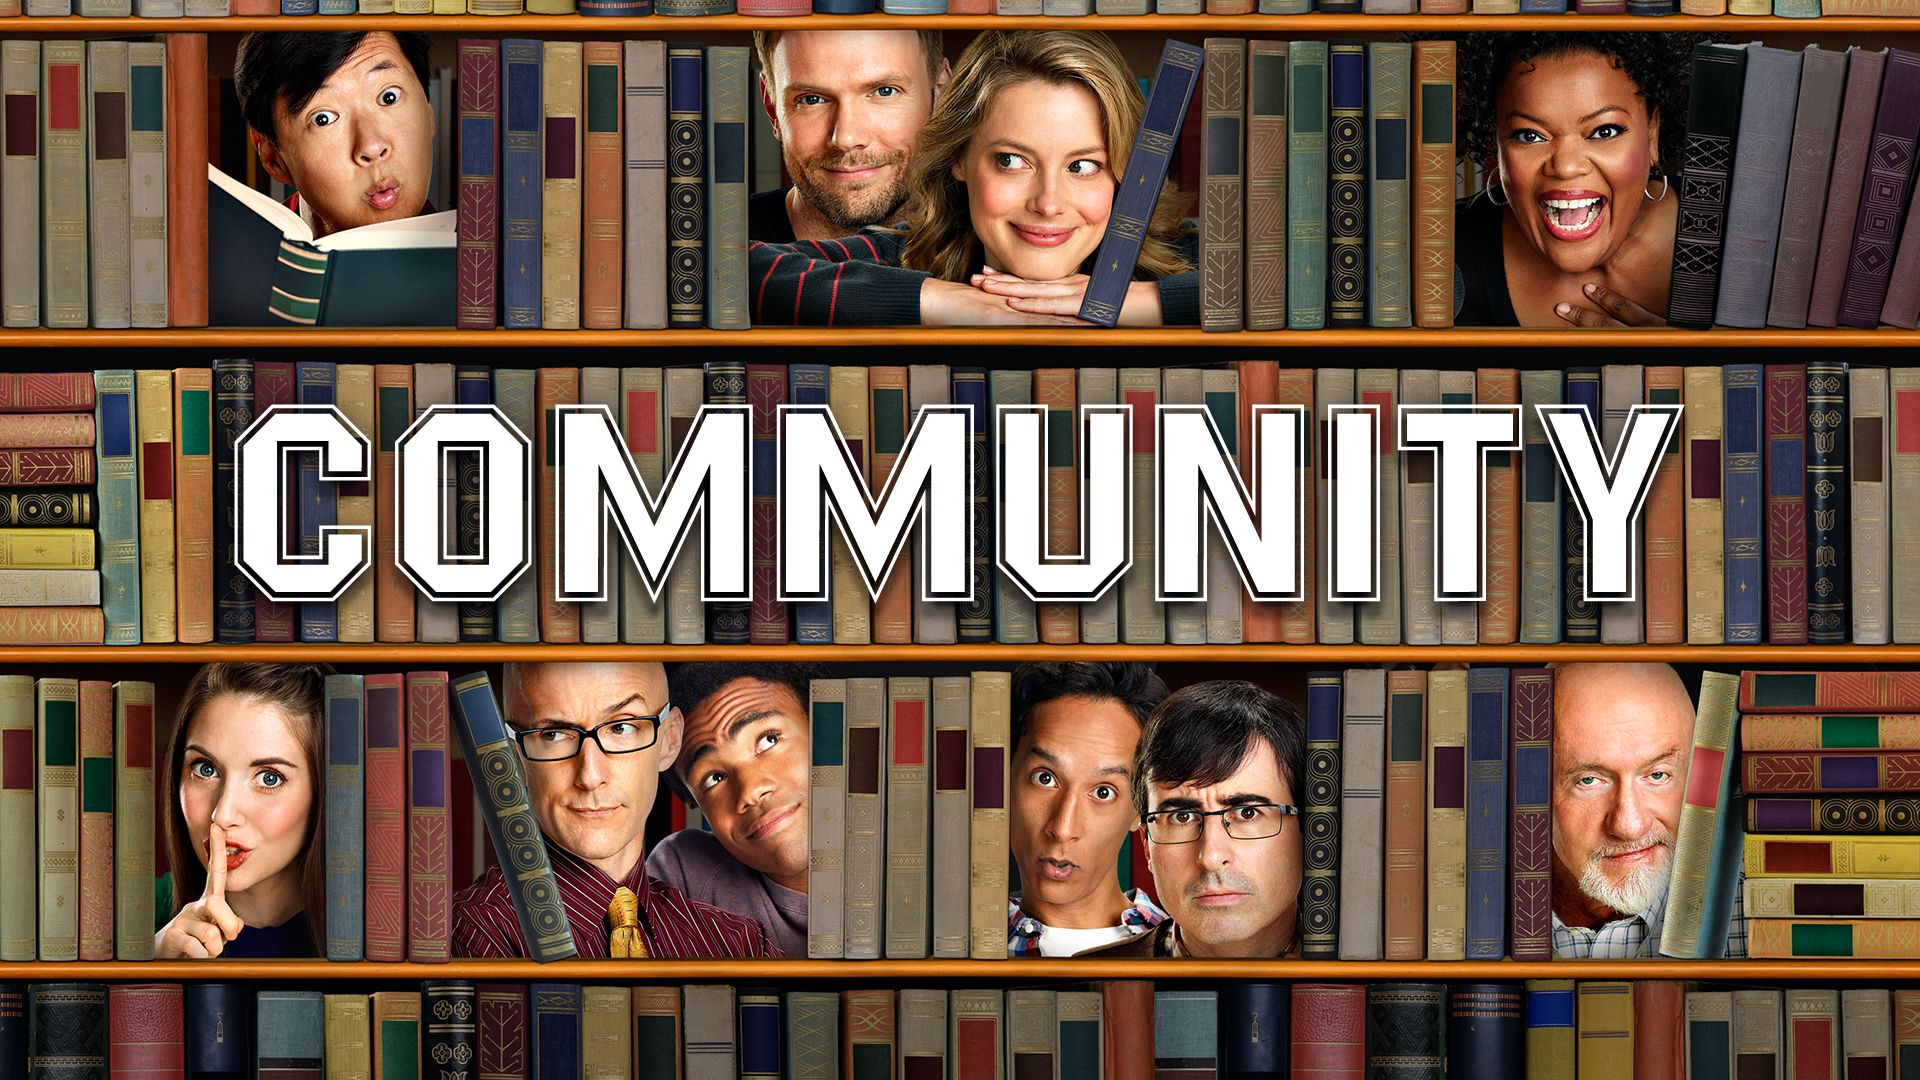 community season 3 episode 13 watch